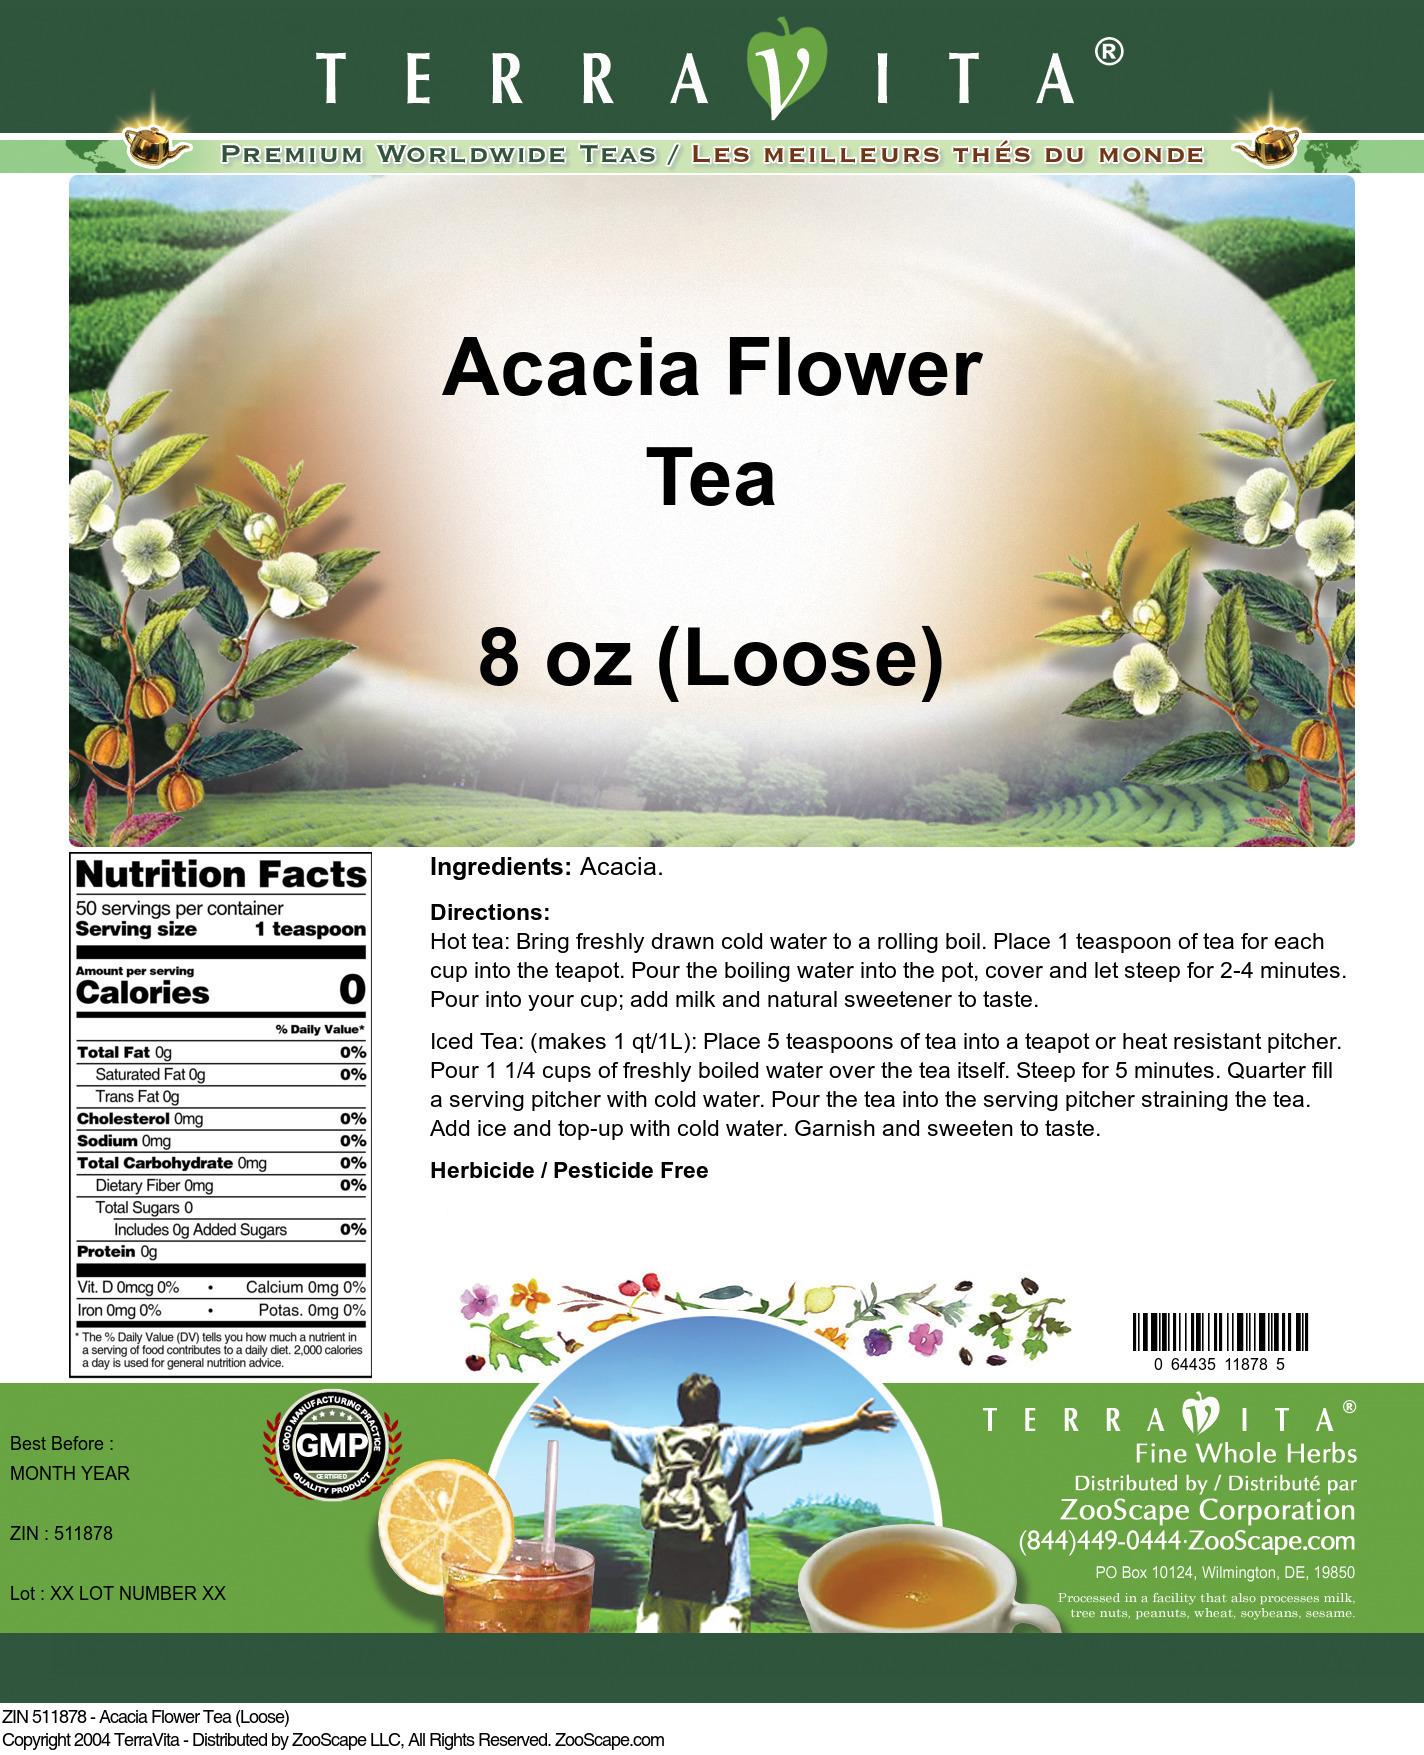 Acacia Flower Tea (Loose)